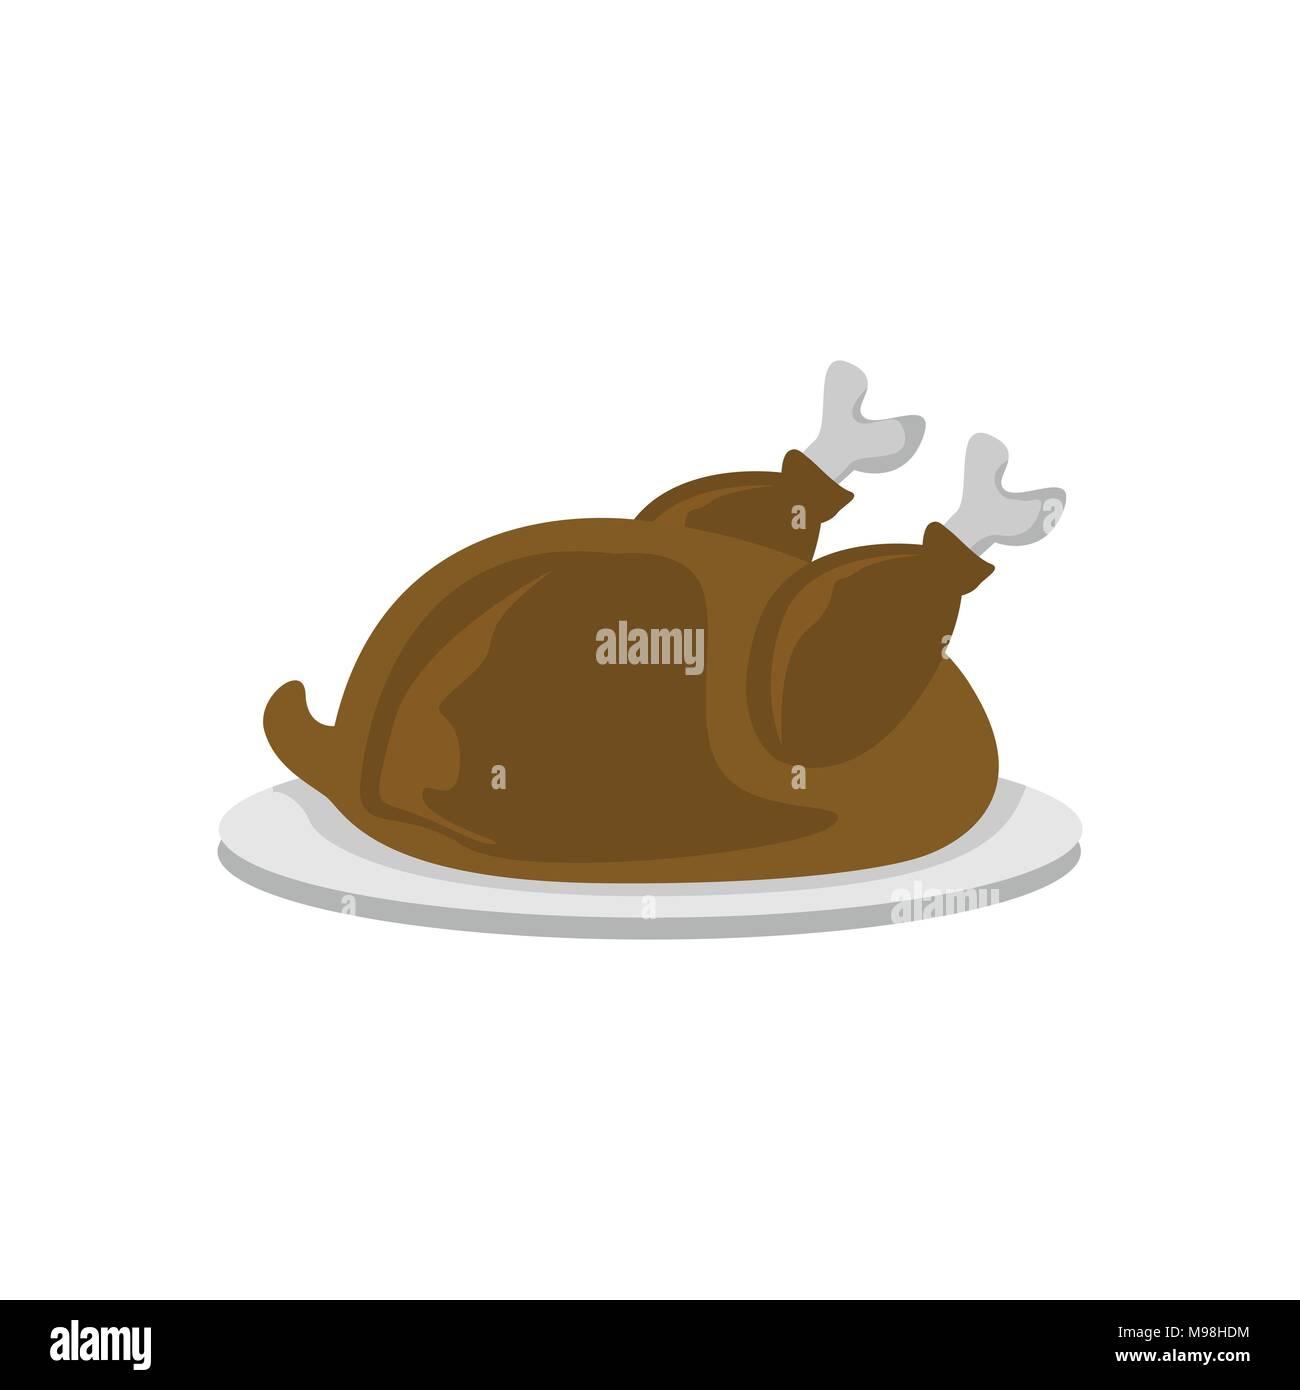 Turkey Meat Food Cafe Vector Illustration Graphic Design - Stock Image